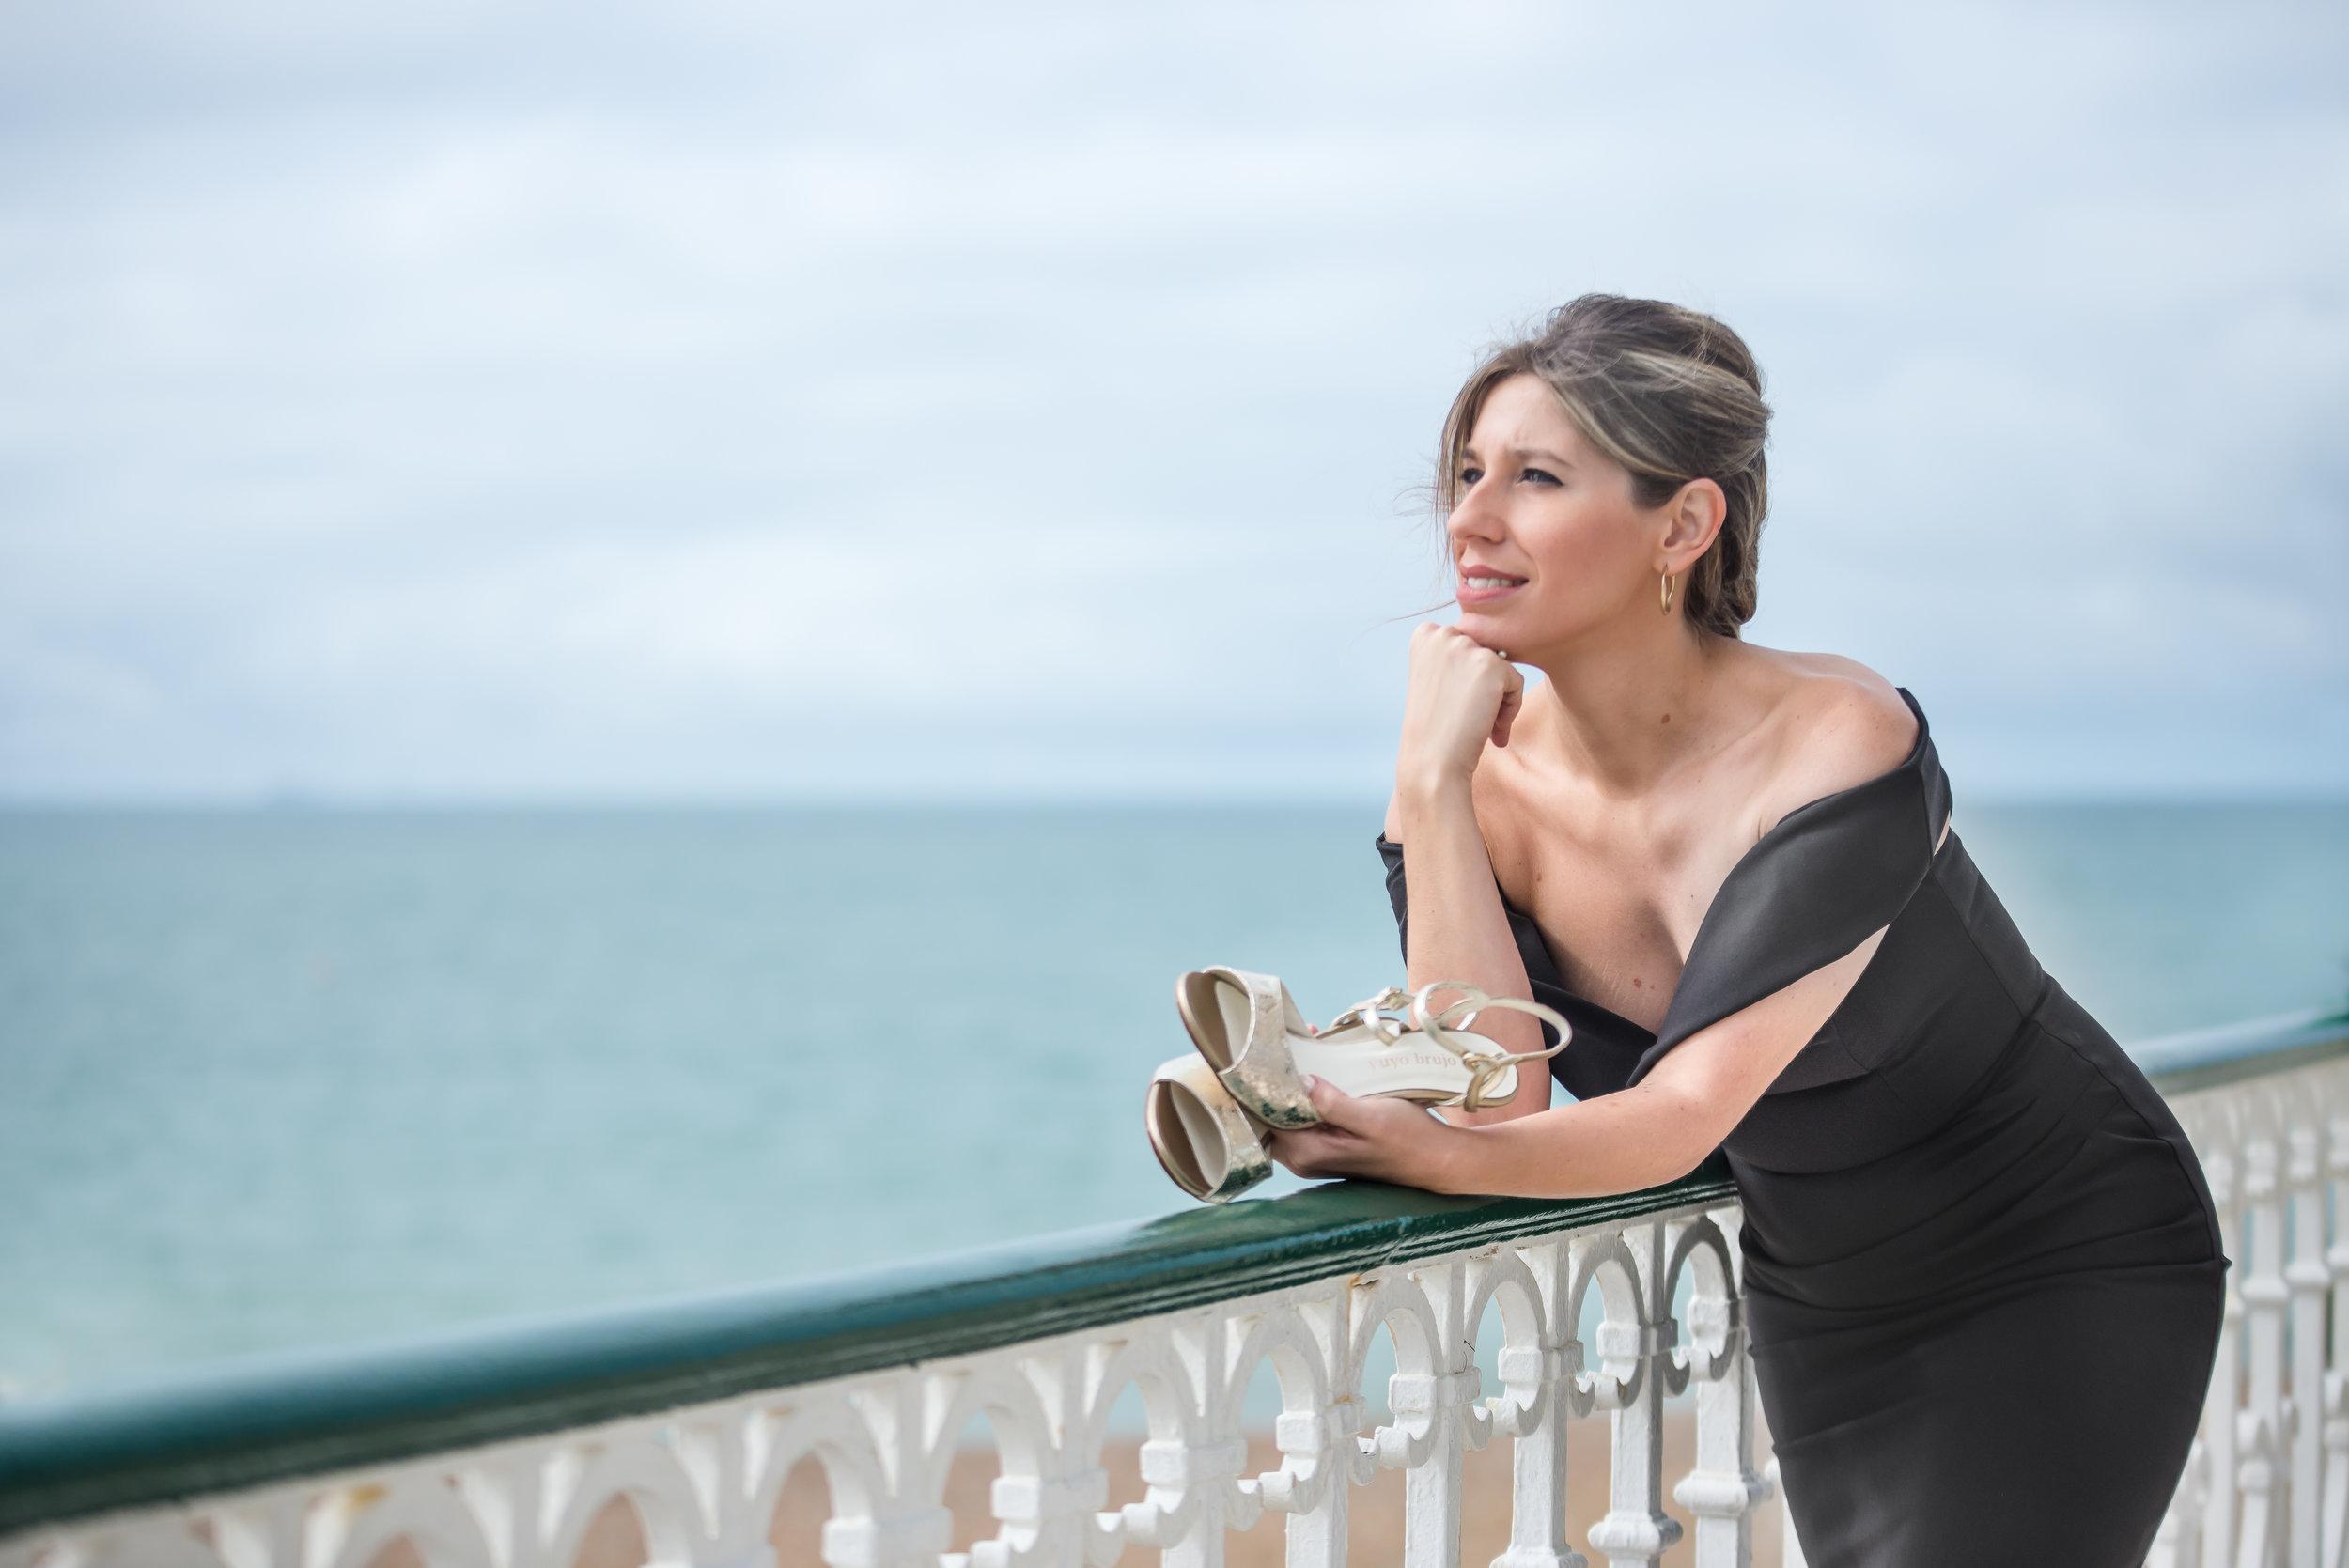 Stefania watching the sea